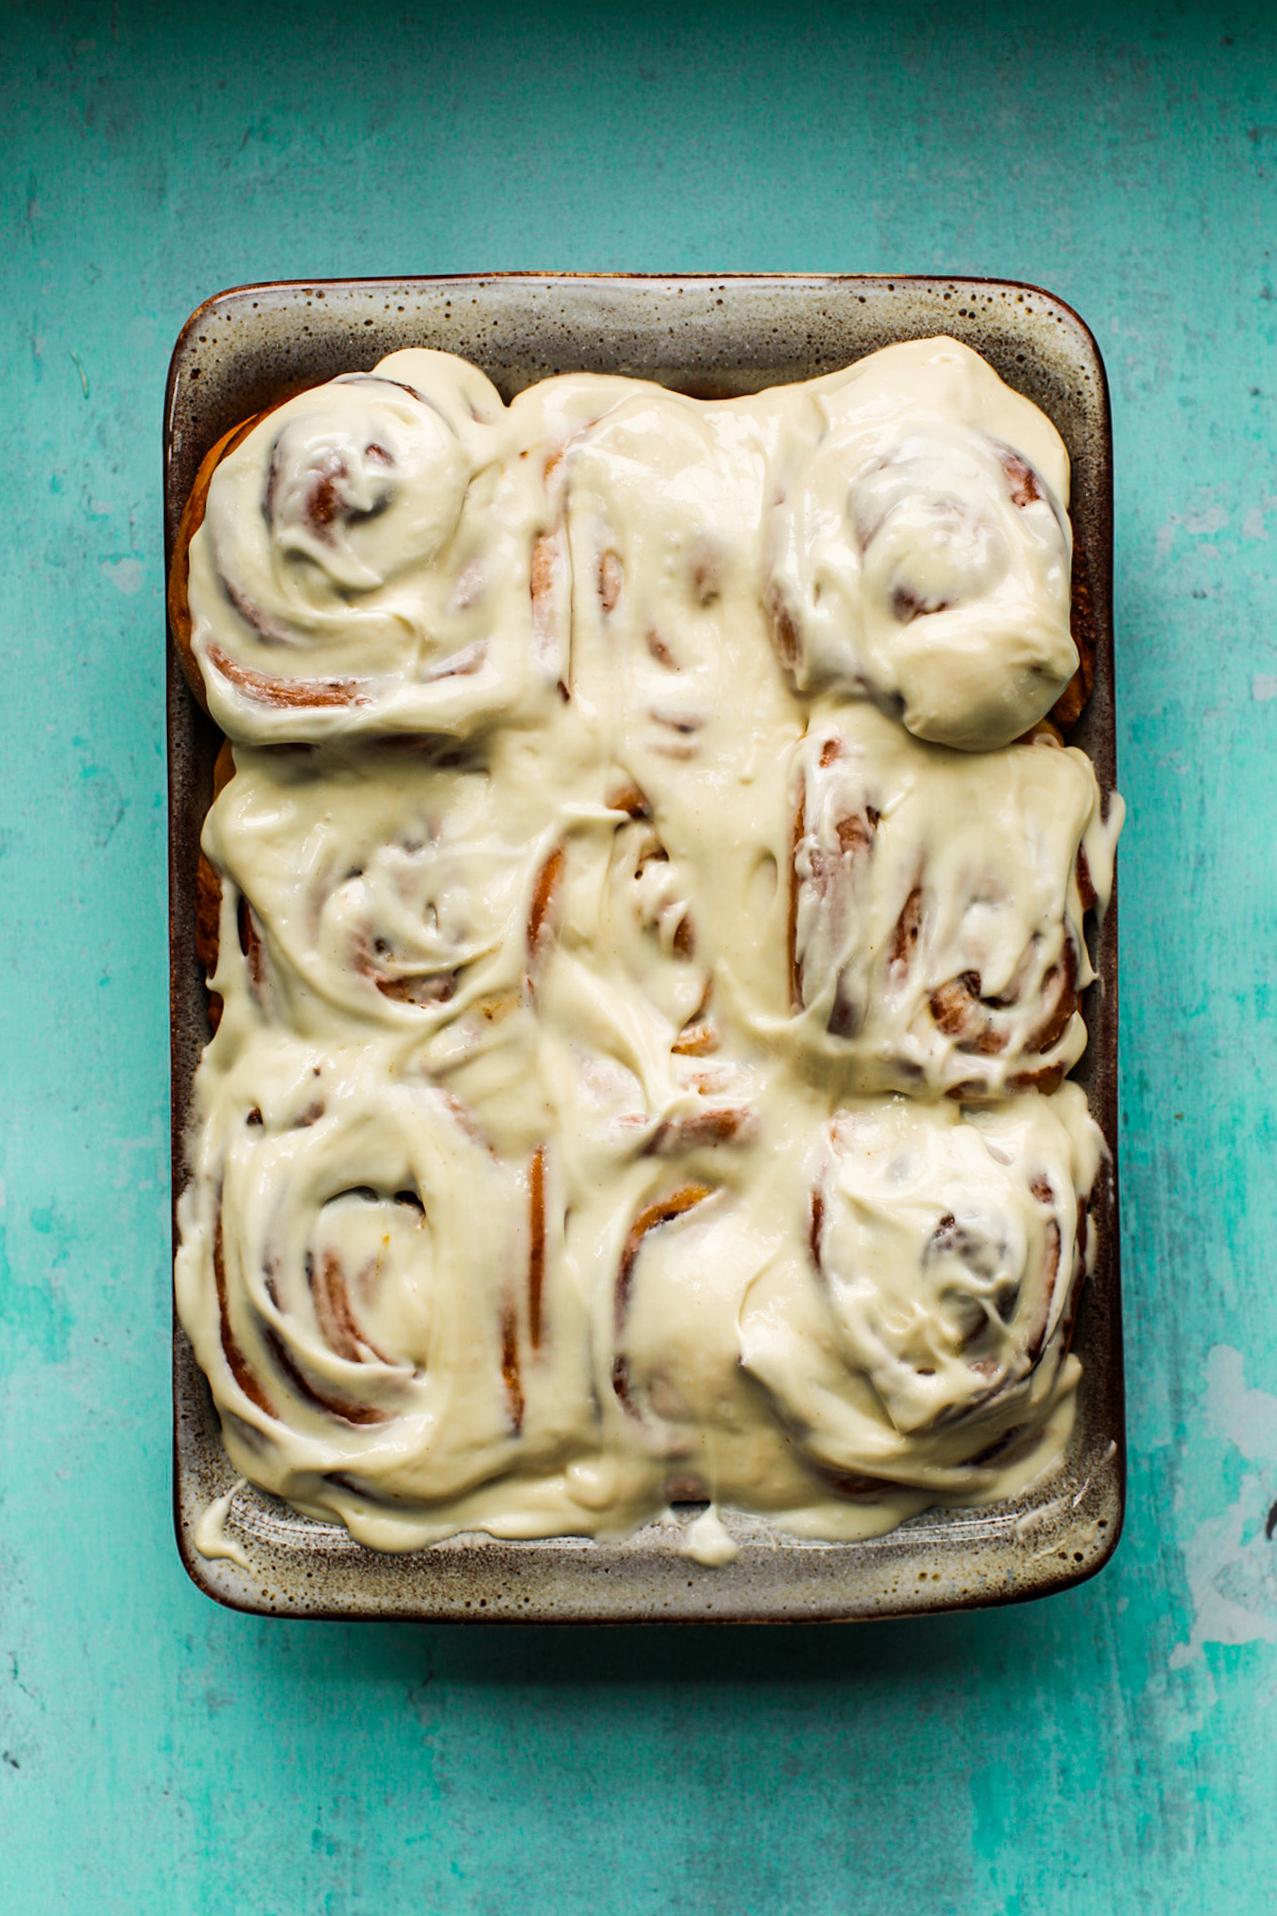 kathy's cinnamon rolls